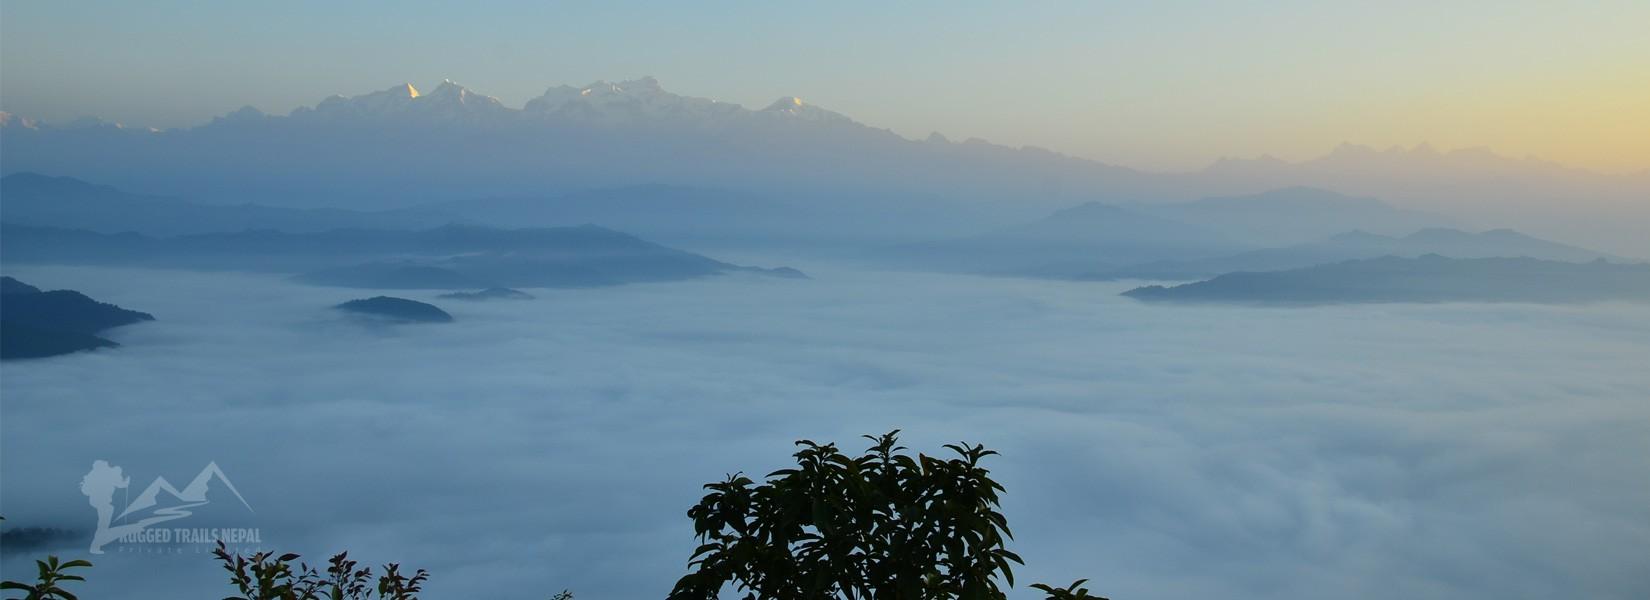 day hiking trips in kathmandu